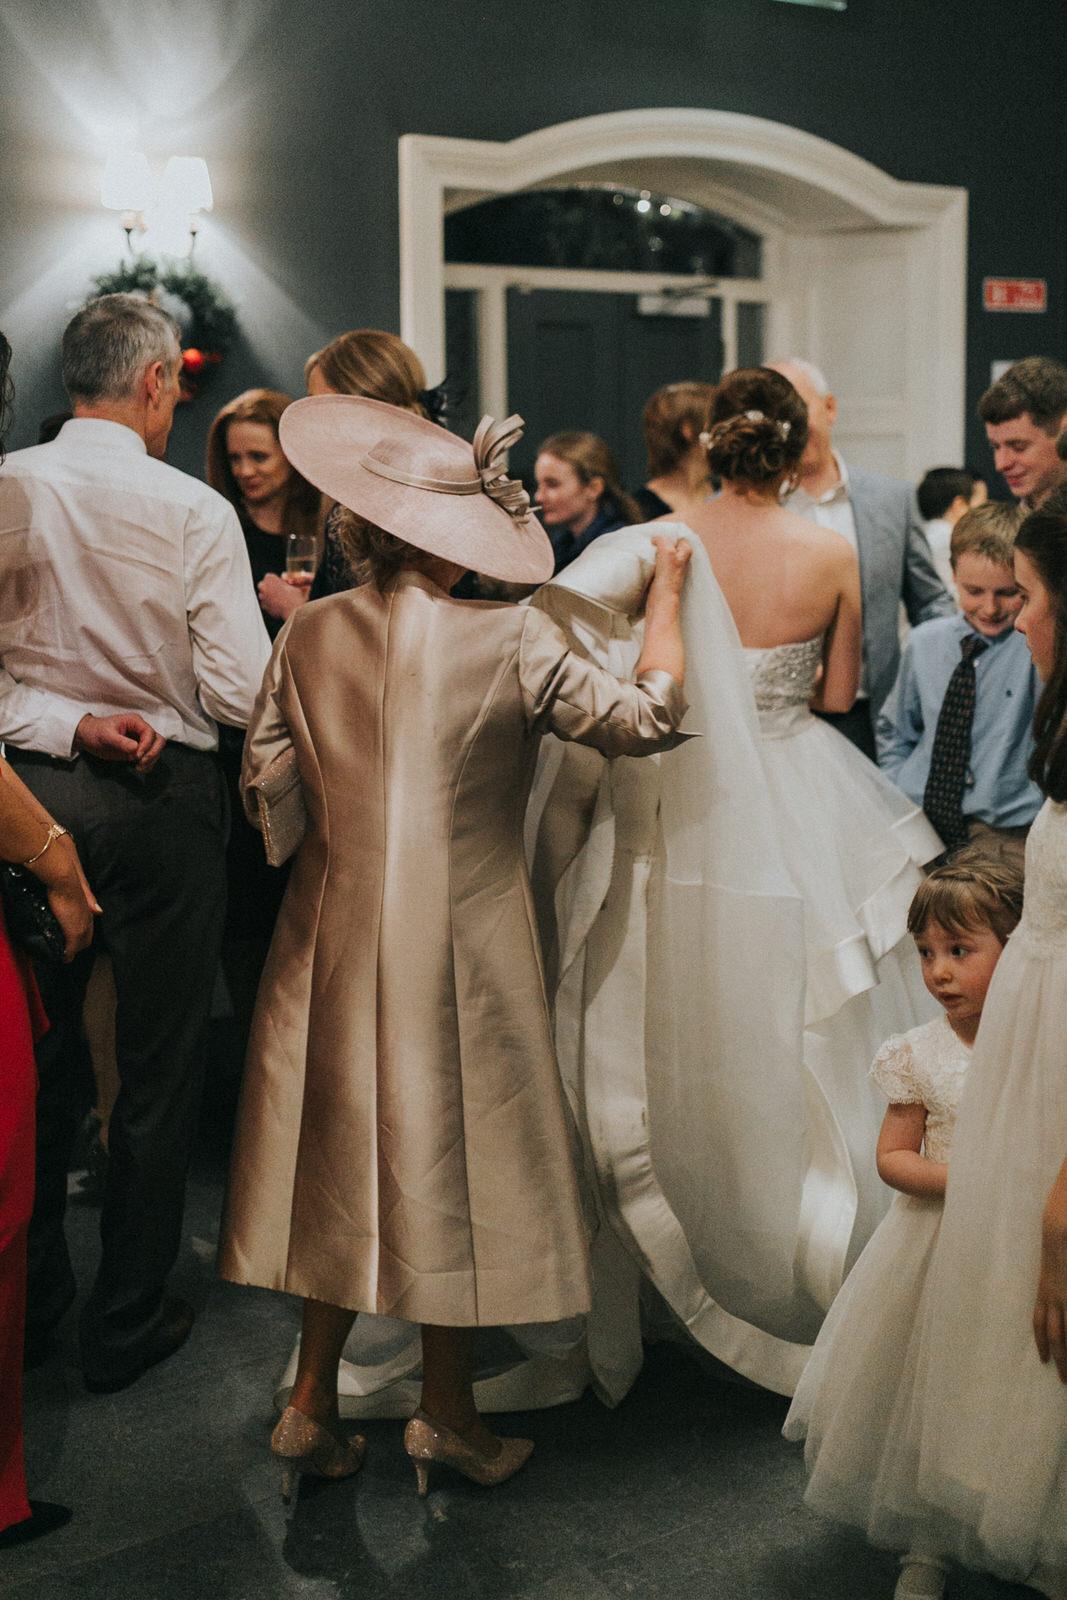 Clonabreany_wedding-photographer_roger_kenny_ireland_097.jpg